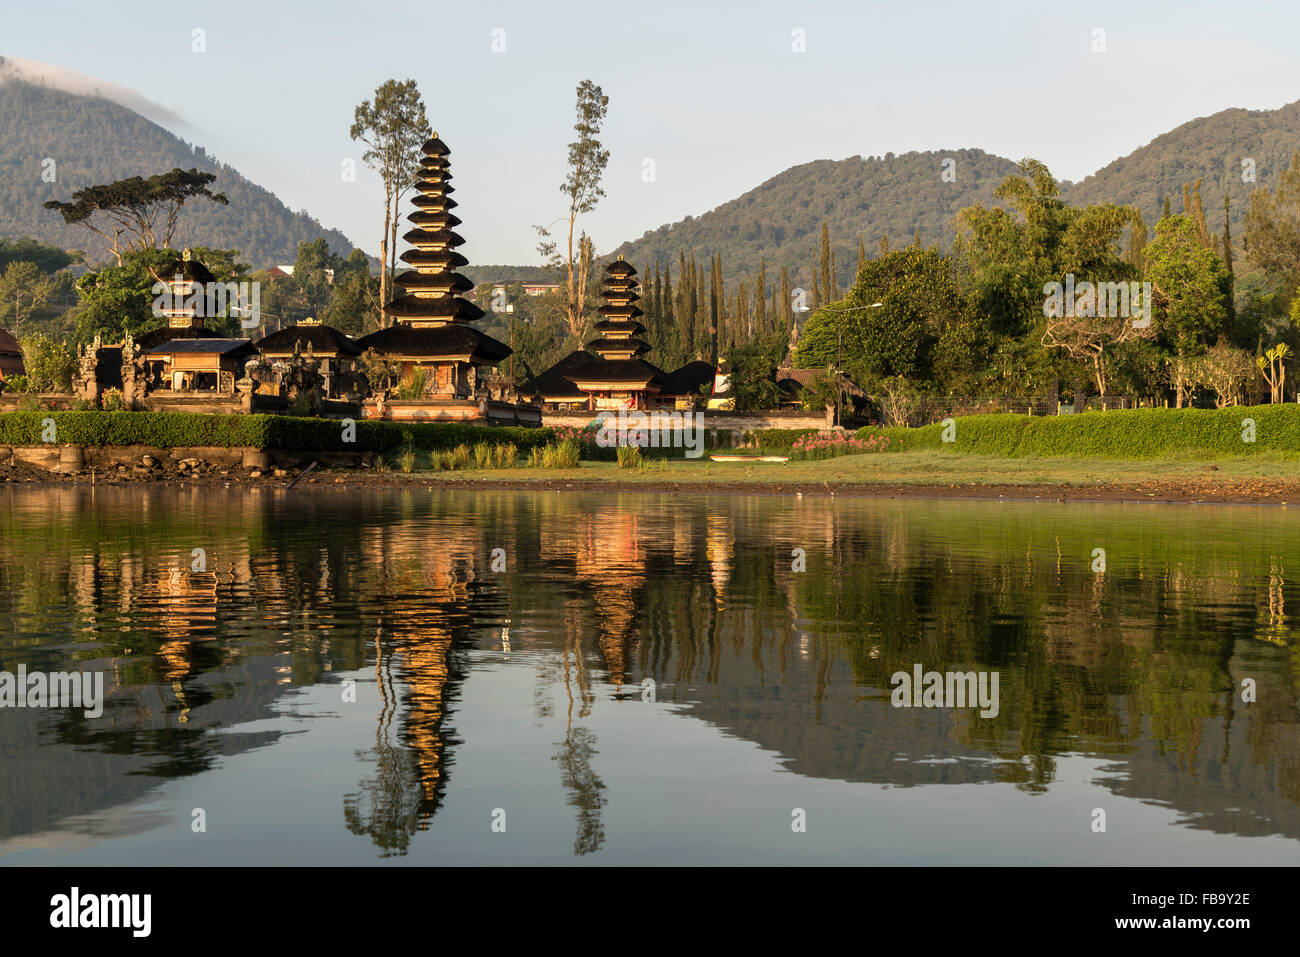 the major Shivaite and water temple Pura Ulun Danu Bratan on the shores of Lake Bratan, Bedugul, Bali, Indonesia - Stock Image